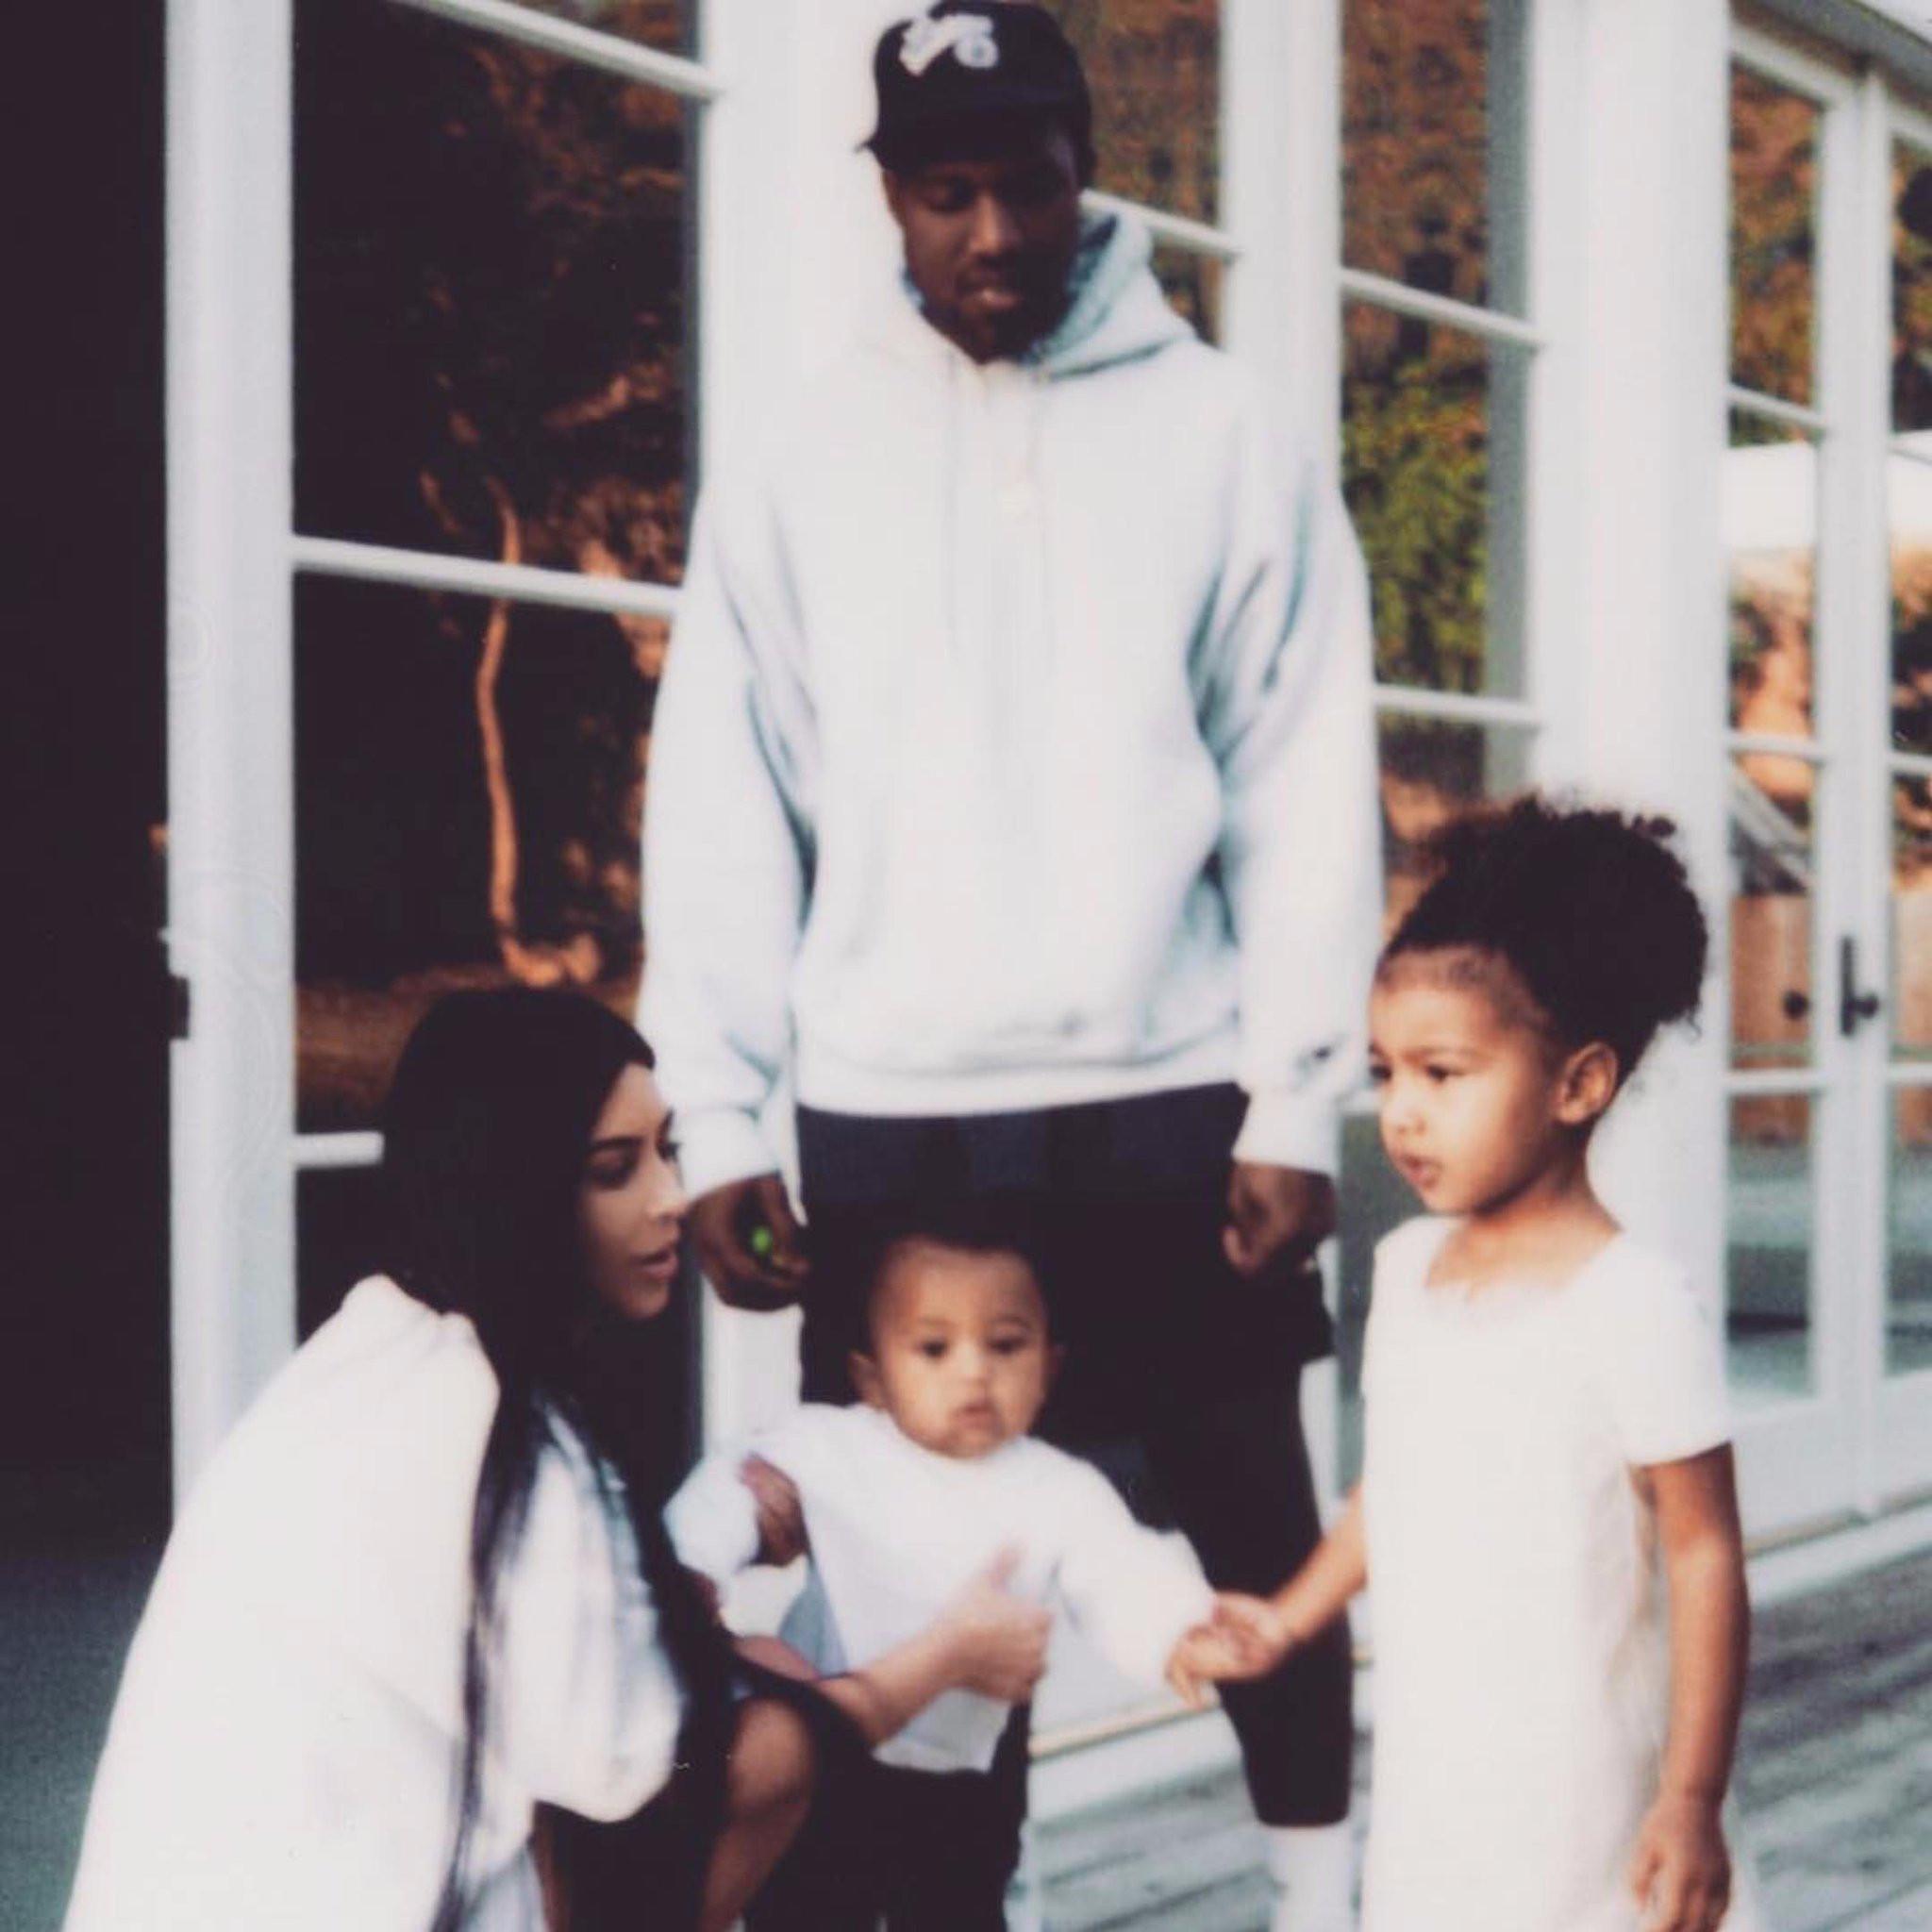 Kim-Kardashian-Family-Instagram-Picture-January-2017.jpg